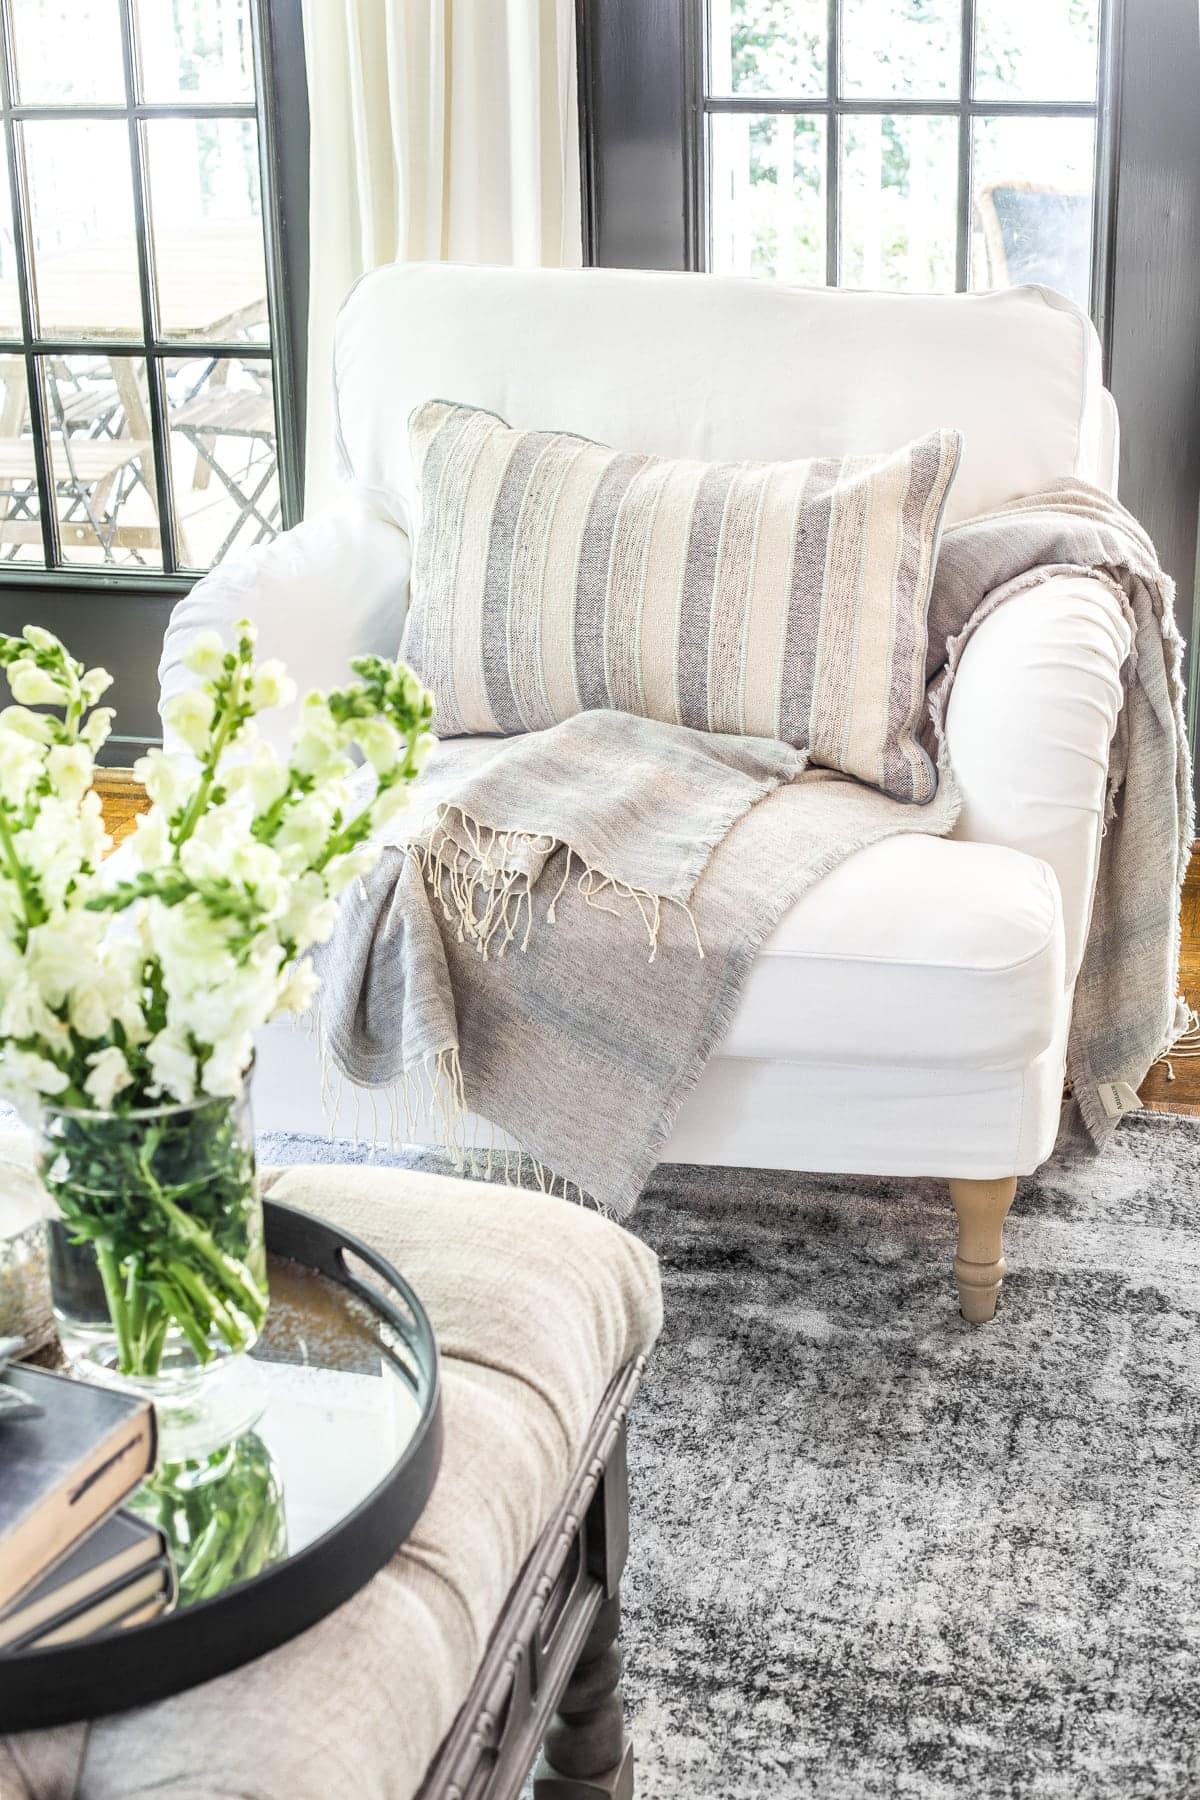 New Slipcovers For The Ikea Living Room Furniture Bless Er House